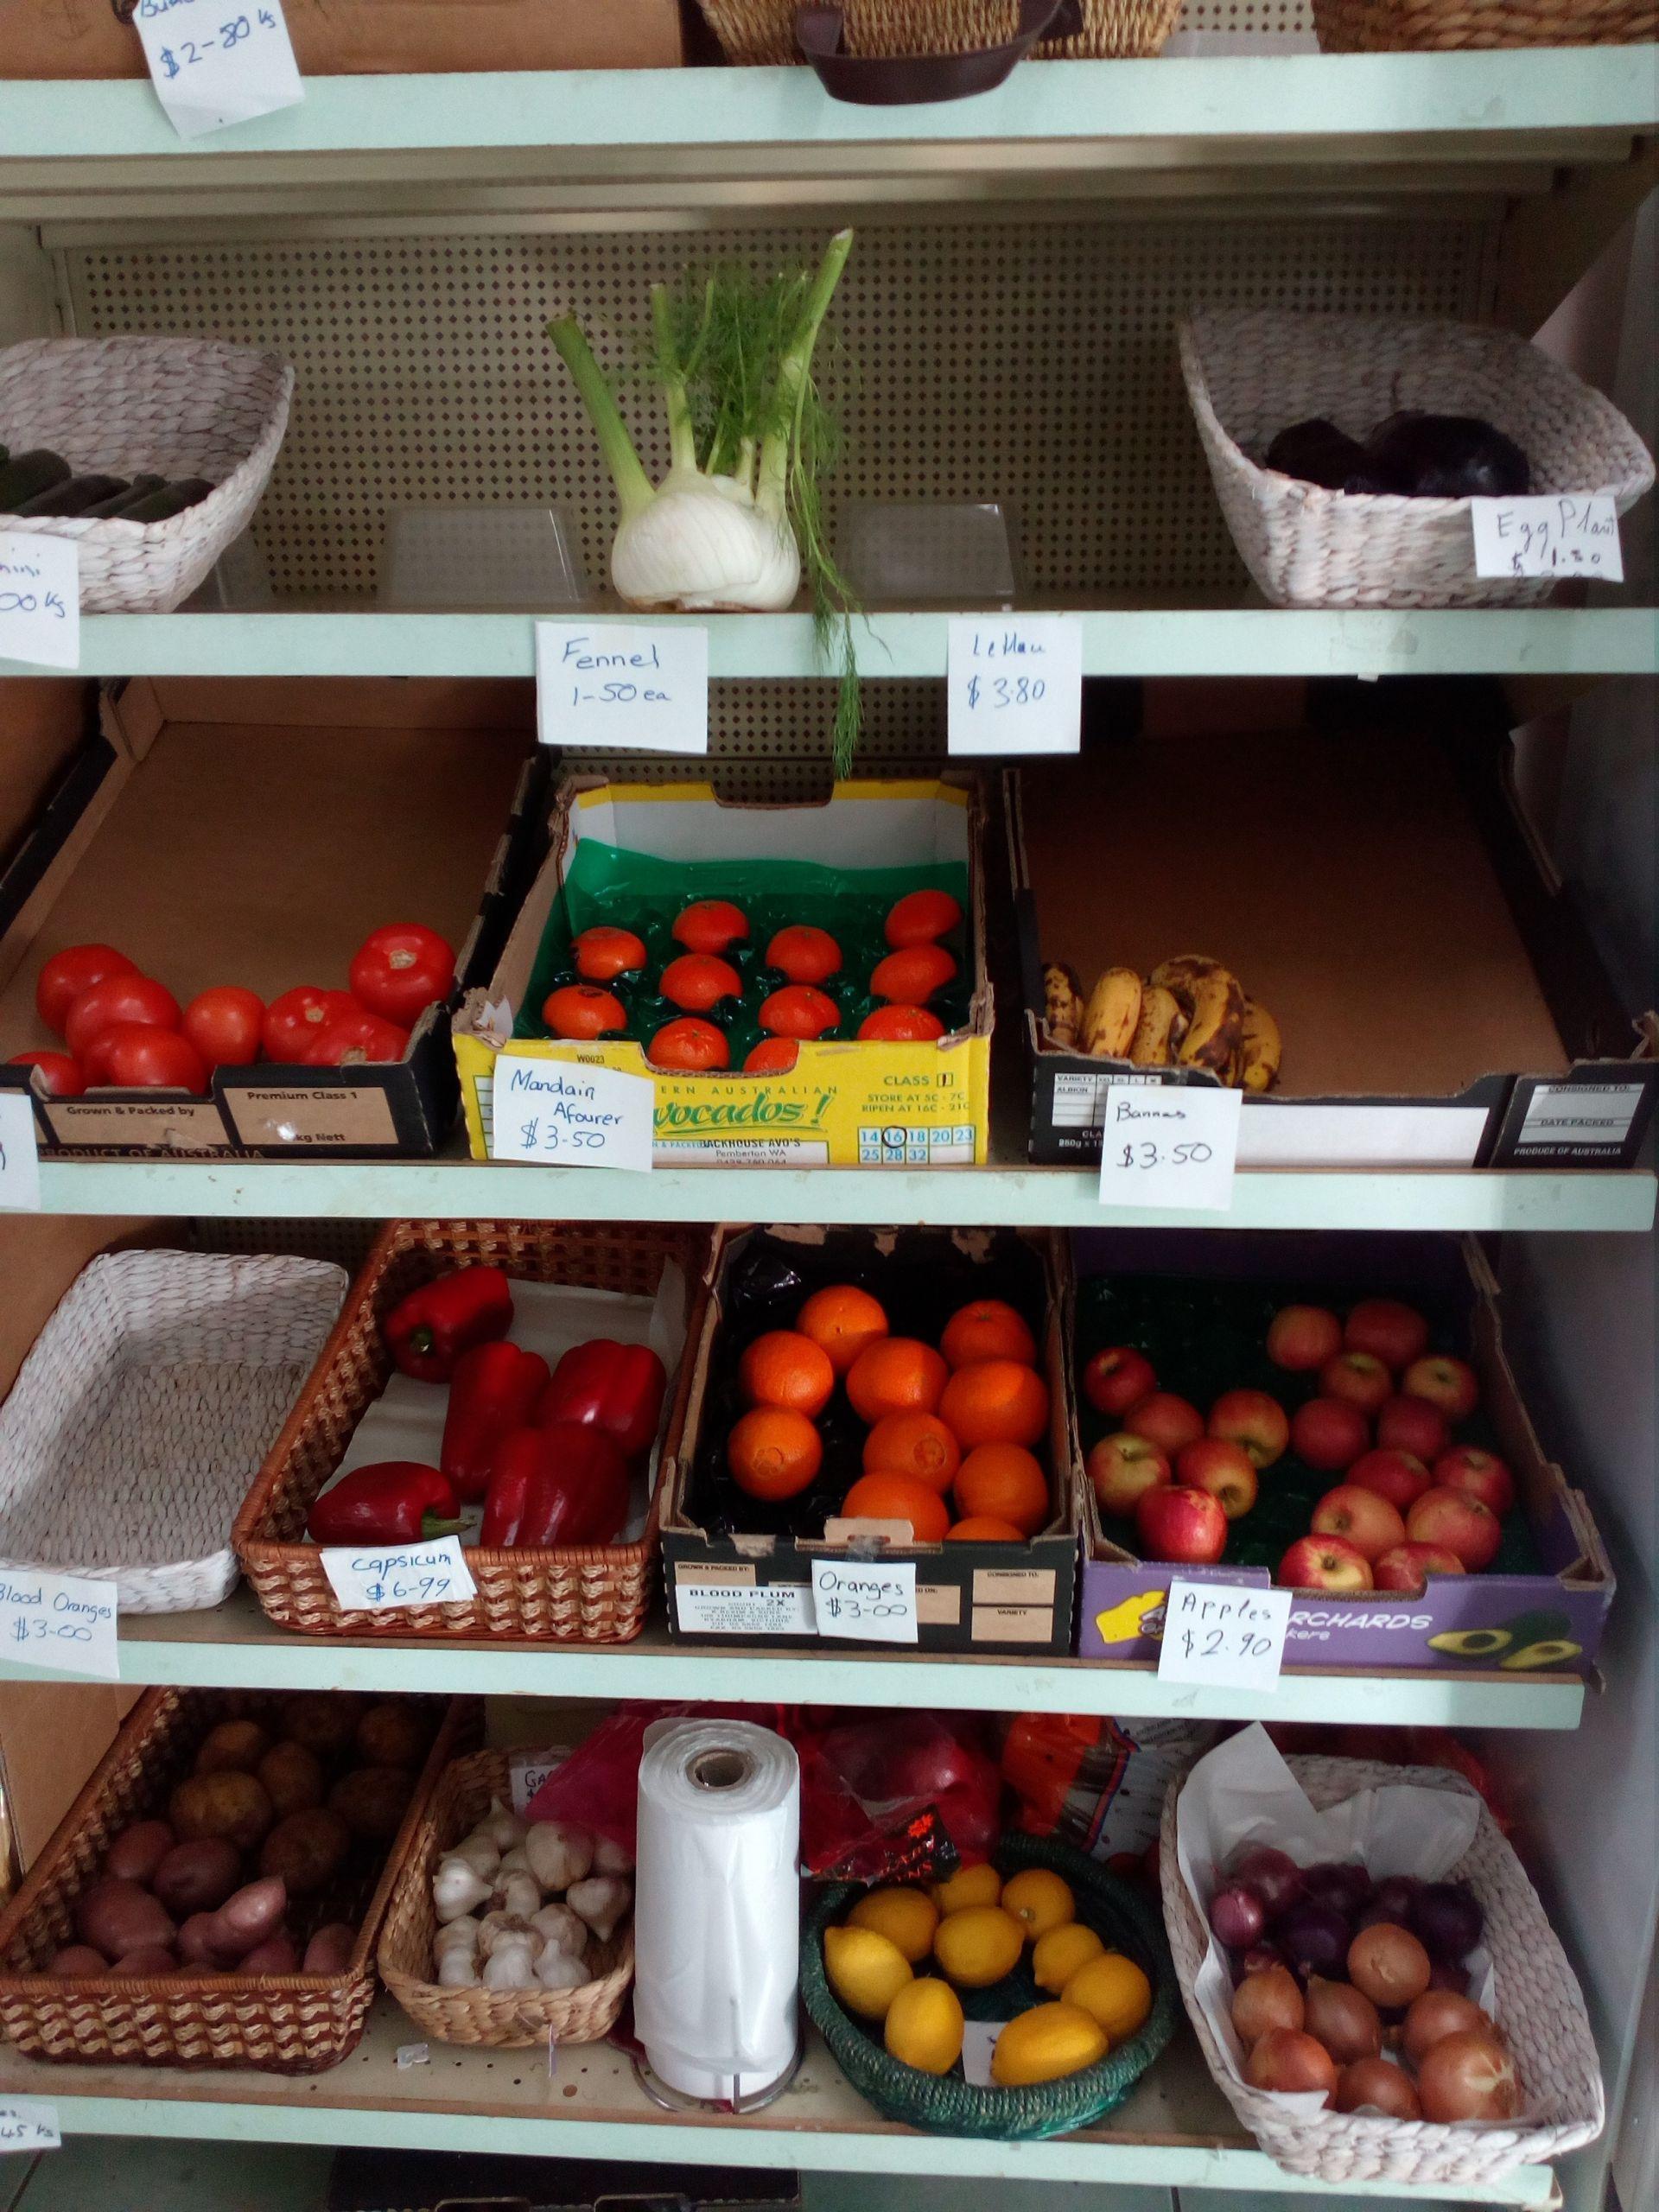 ANDERSON ROAD DELI / CAFE / FRUIT SHOP - NOW FOR SALE